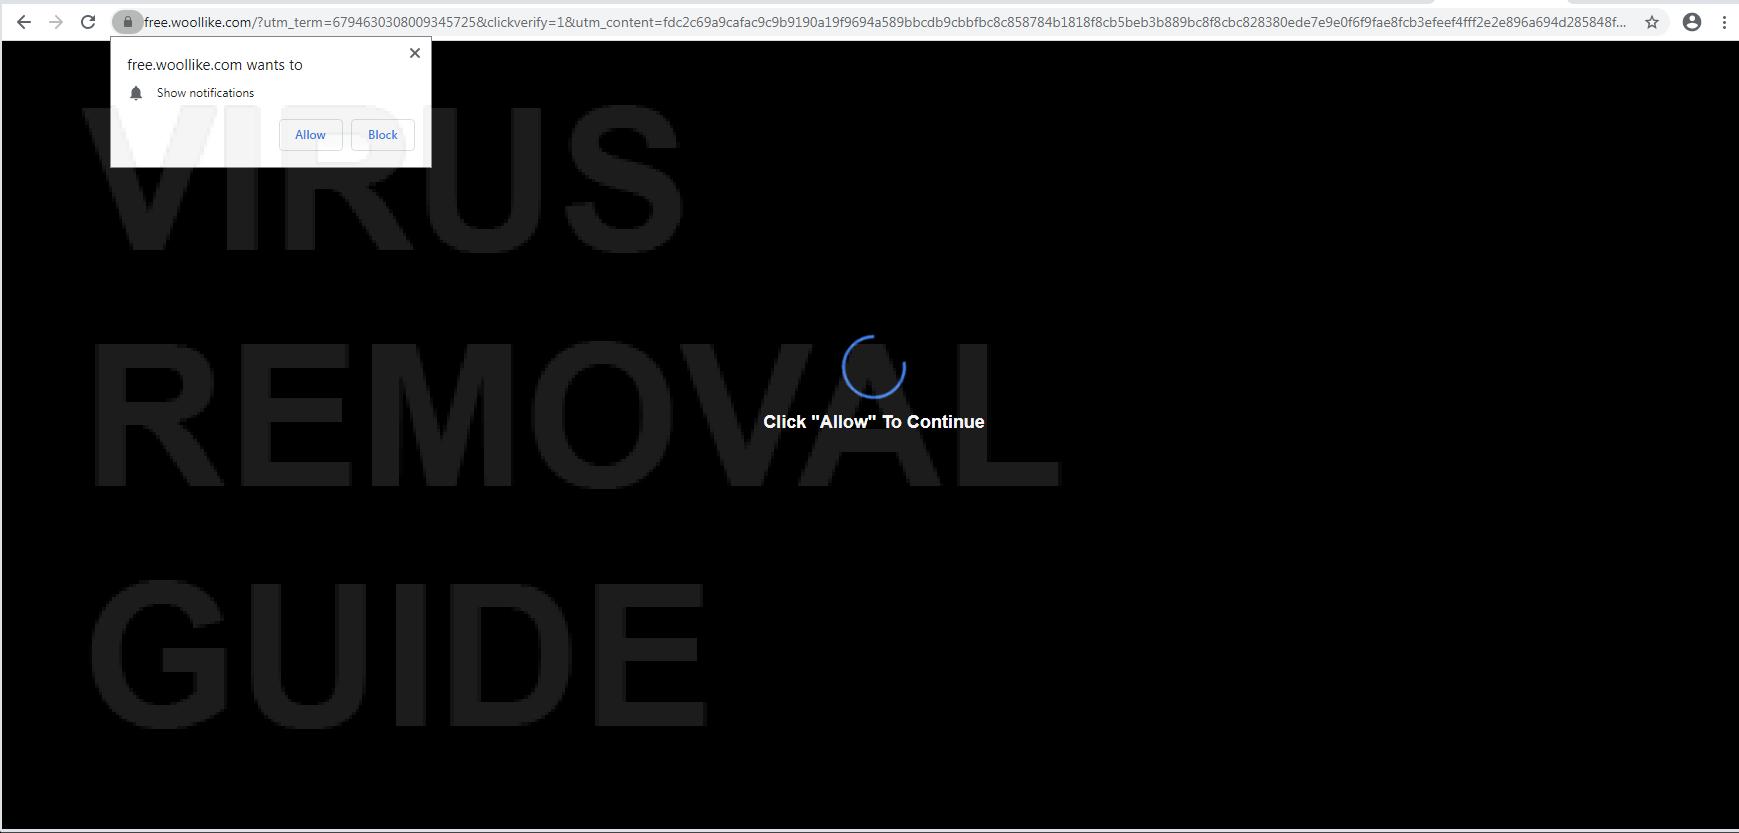 Woollike.com